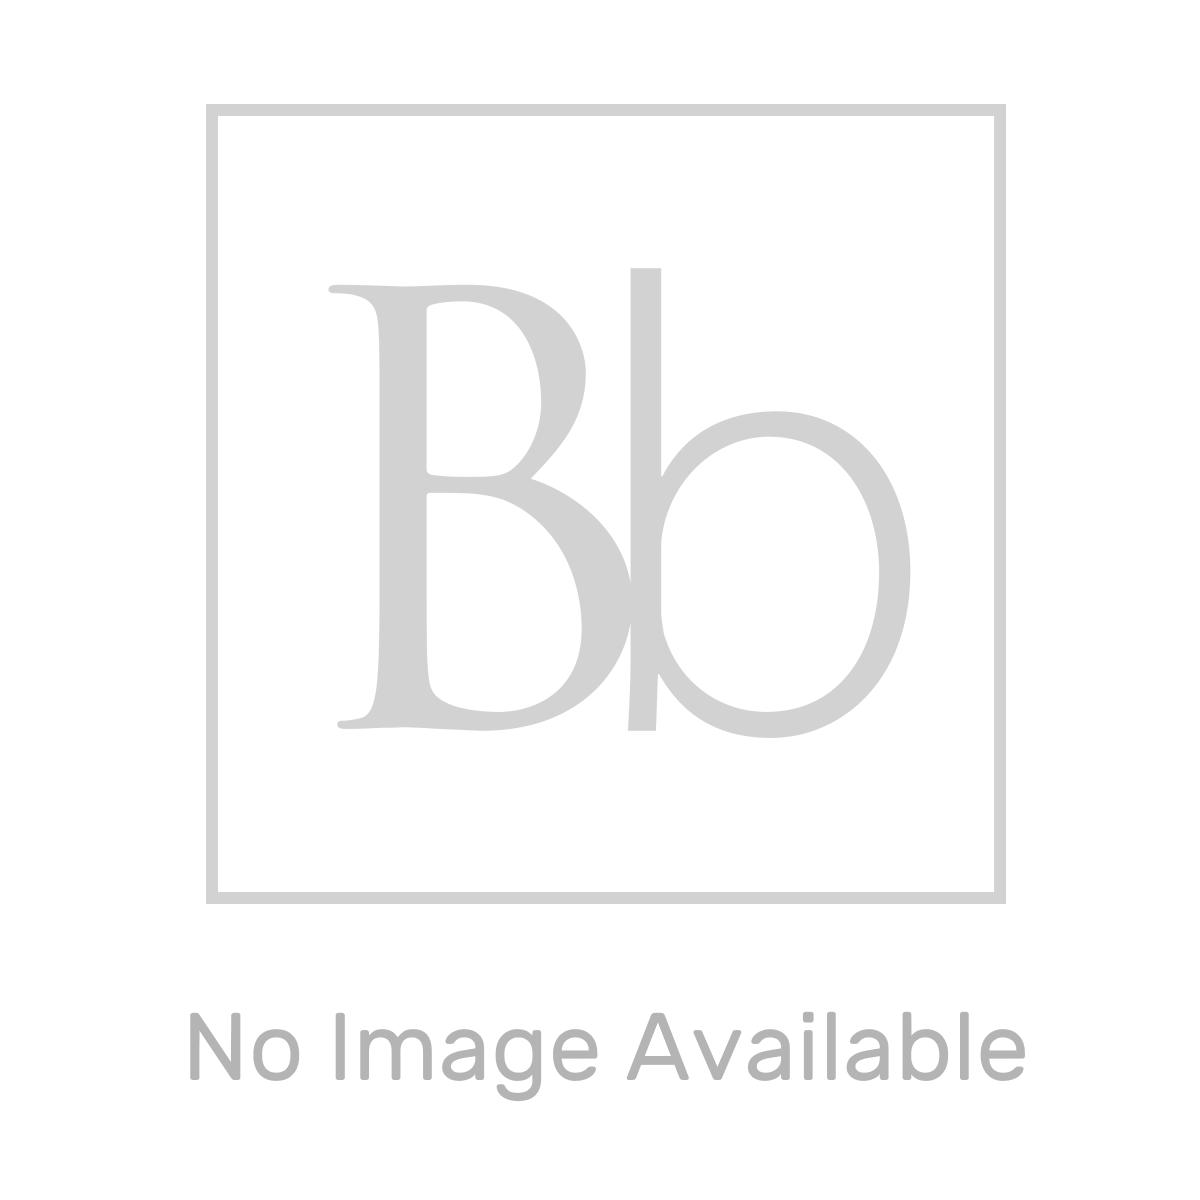 Aquadart Black Slate Shower Tray 1700 x 700